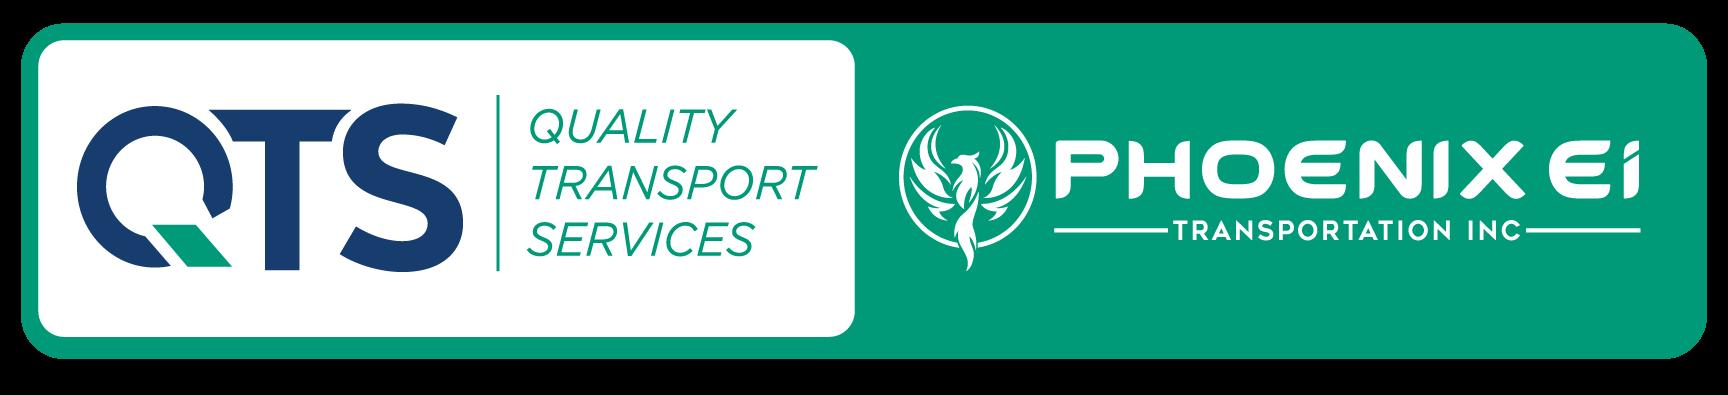 Quality Transport Services of Arizona logo